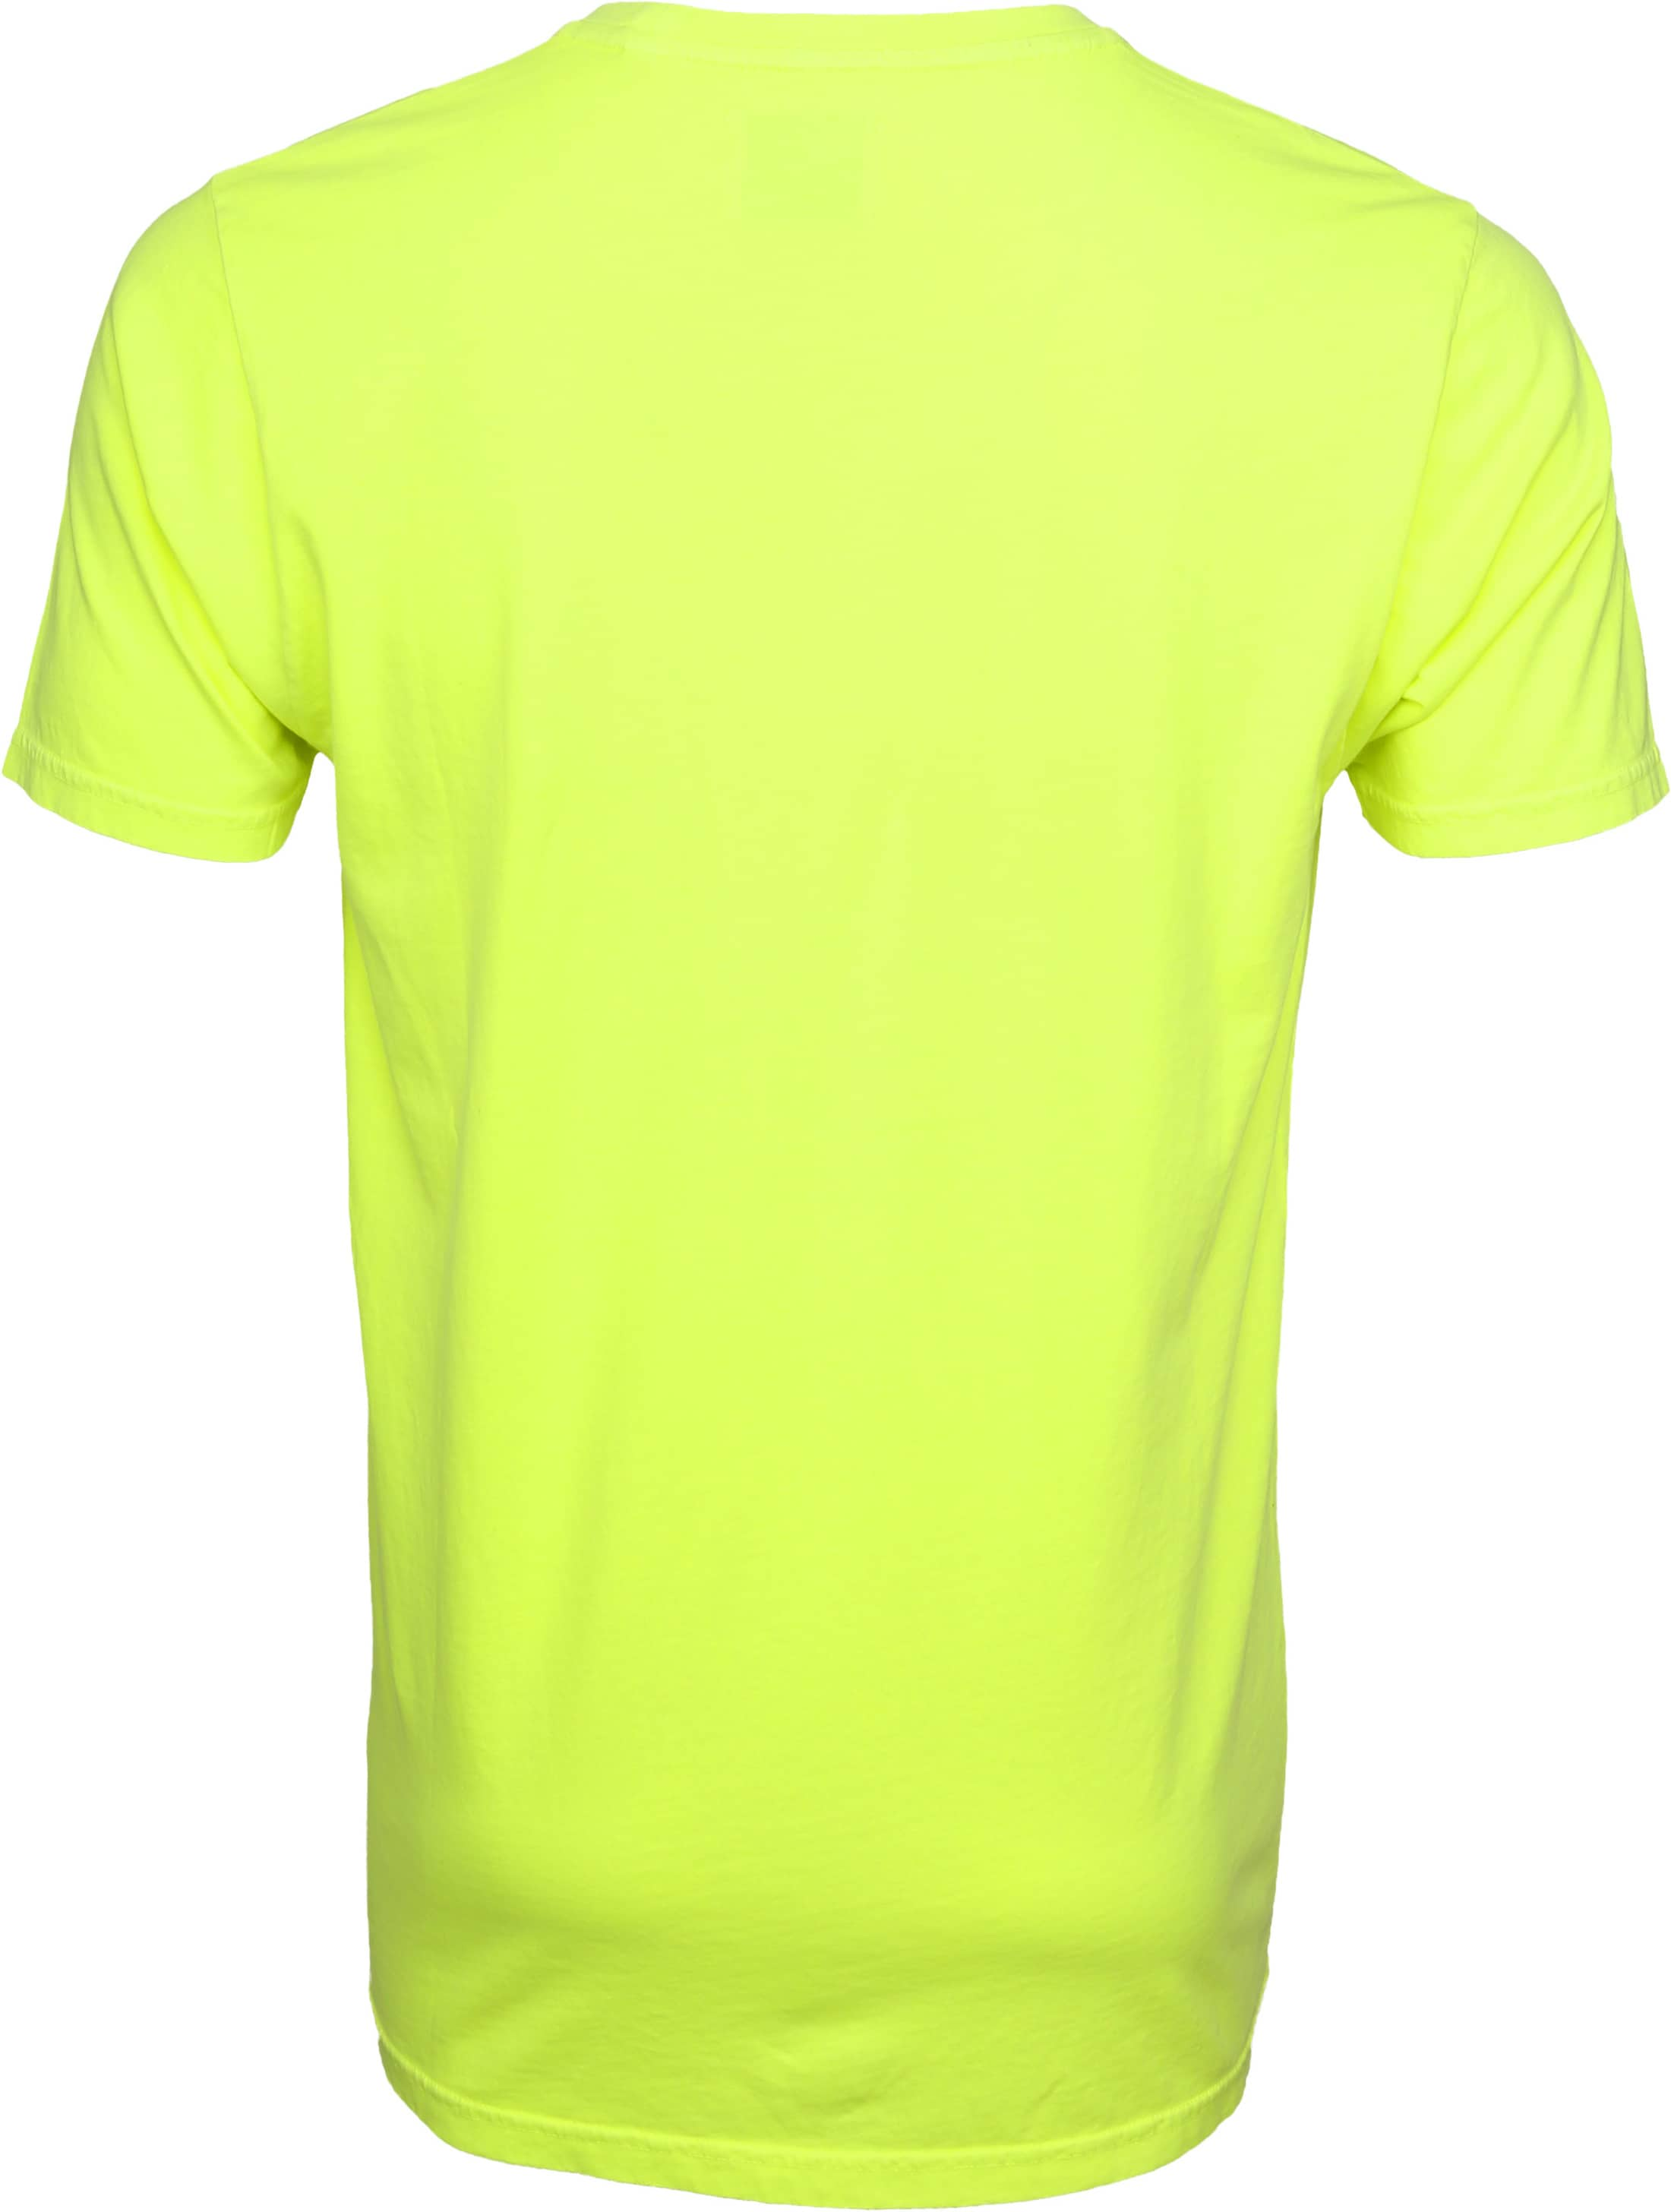 Colorful Standard T-shirt Neon Geel foto 3